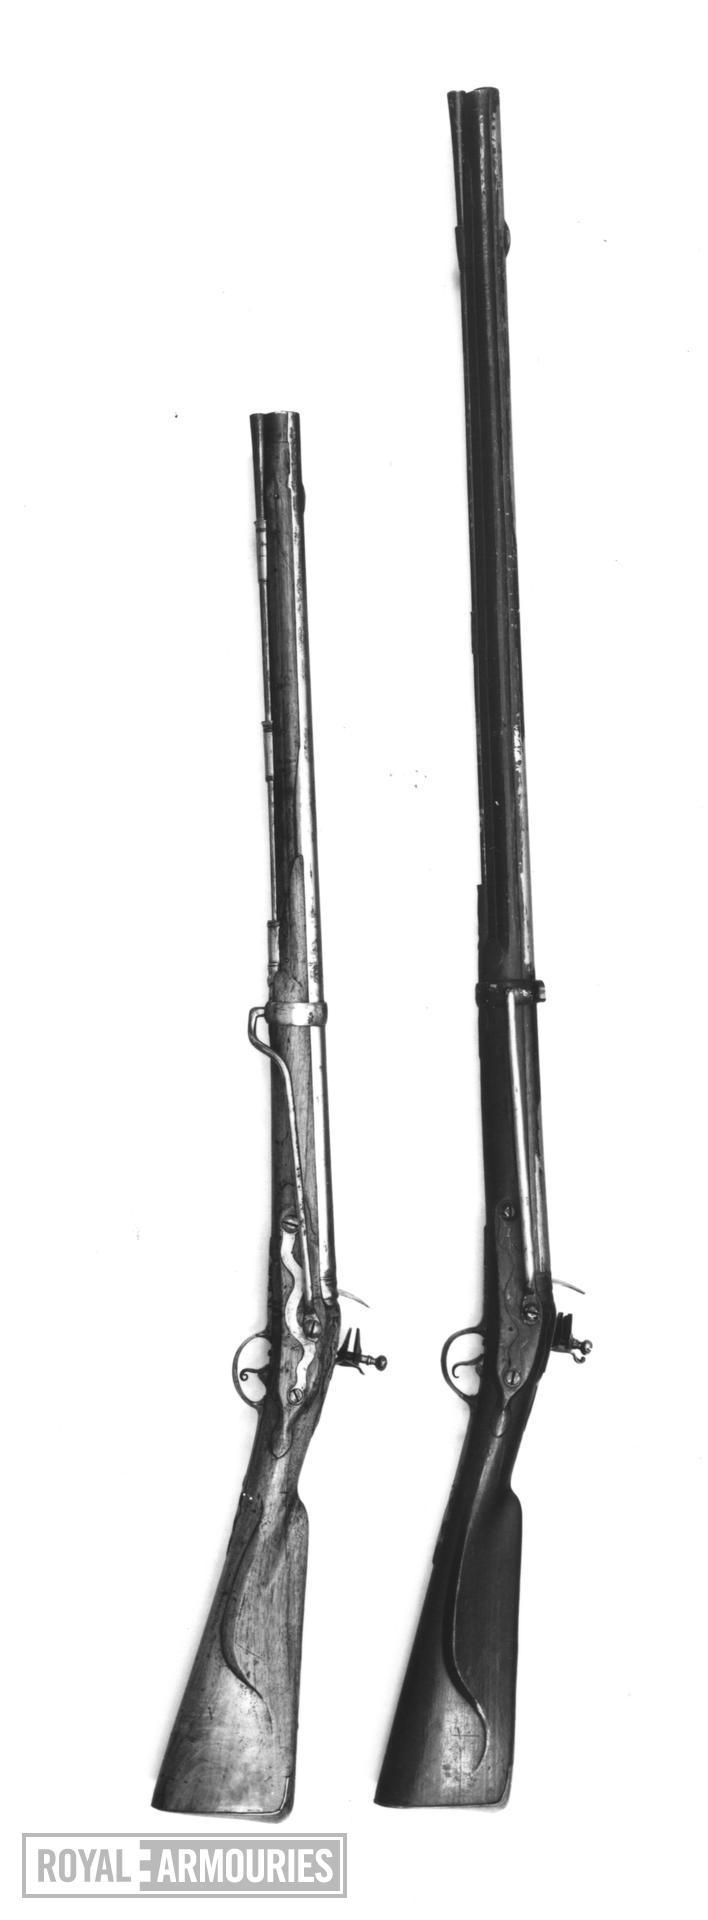 Flintlock muzzle-loading carbine - Cuirassier Model 1722 Flintlock muzzle-loading carbine, Cuirassier Model 1722, about 1750.